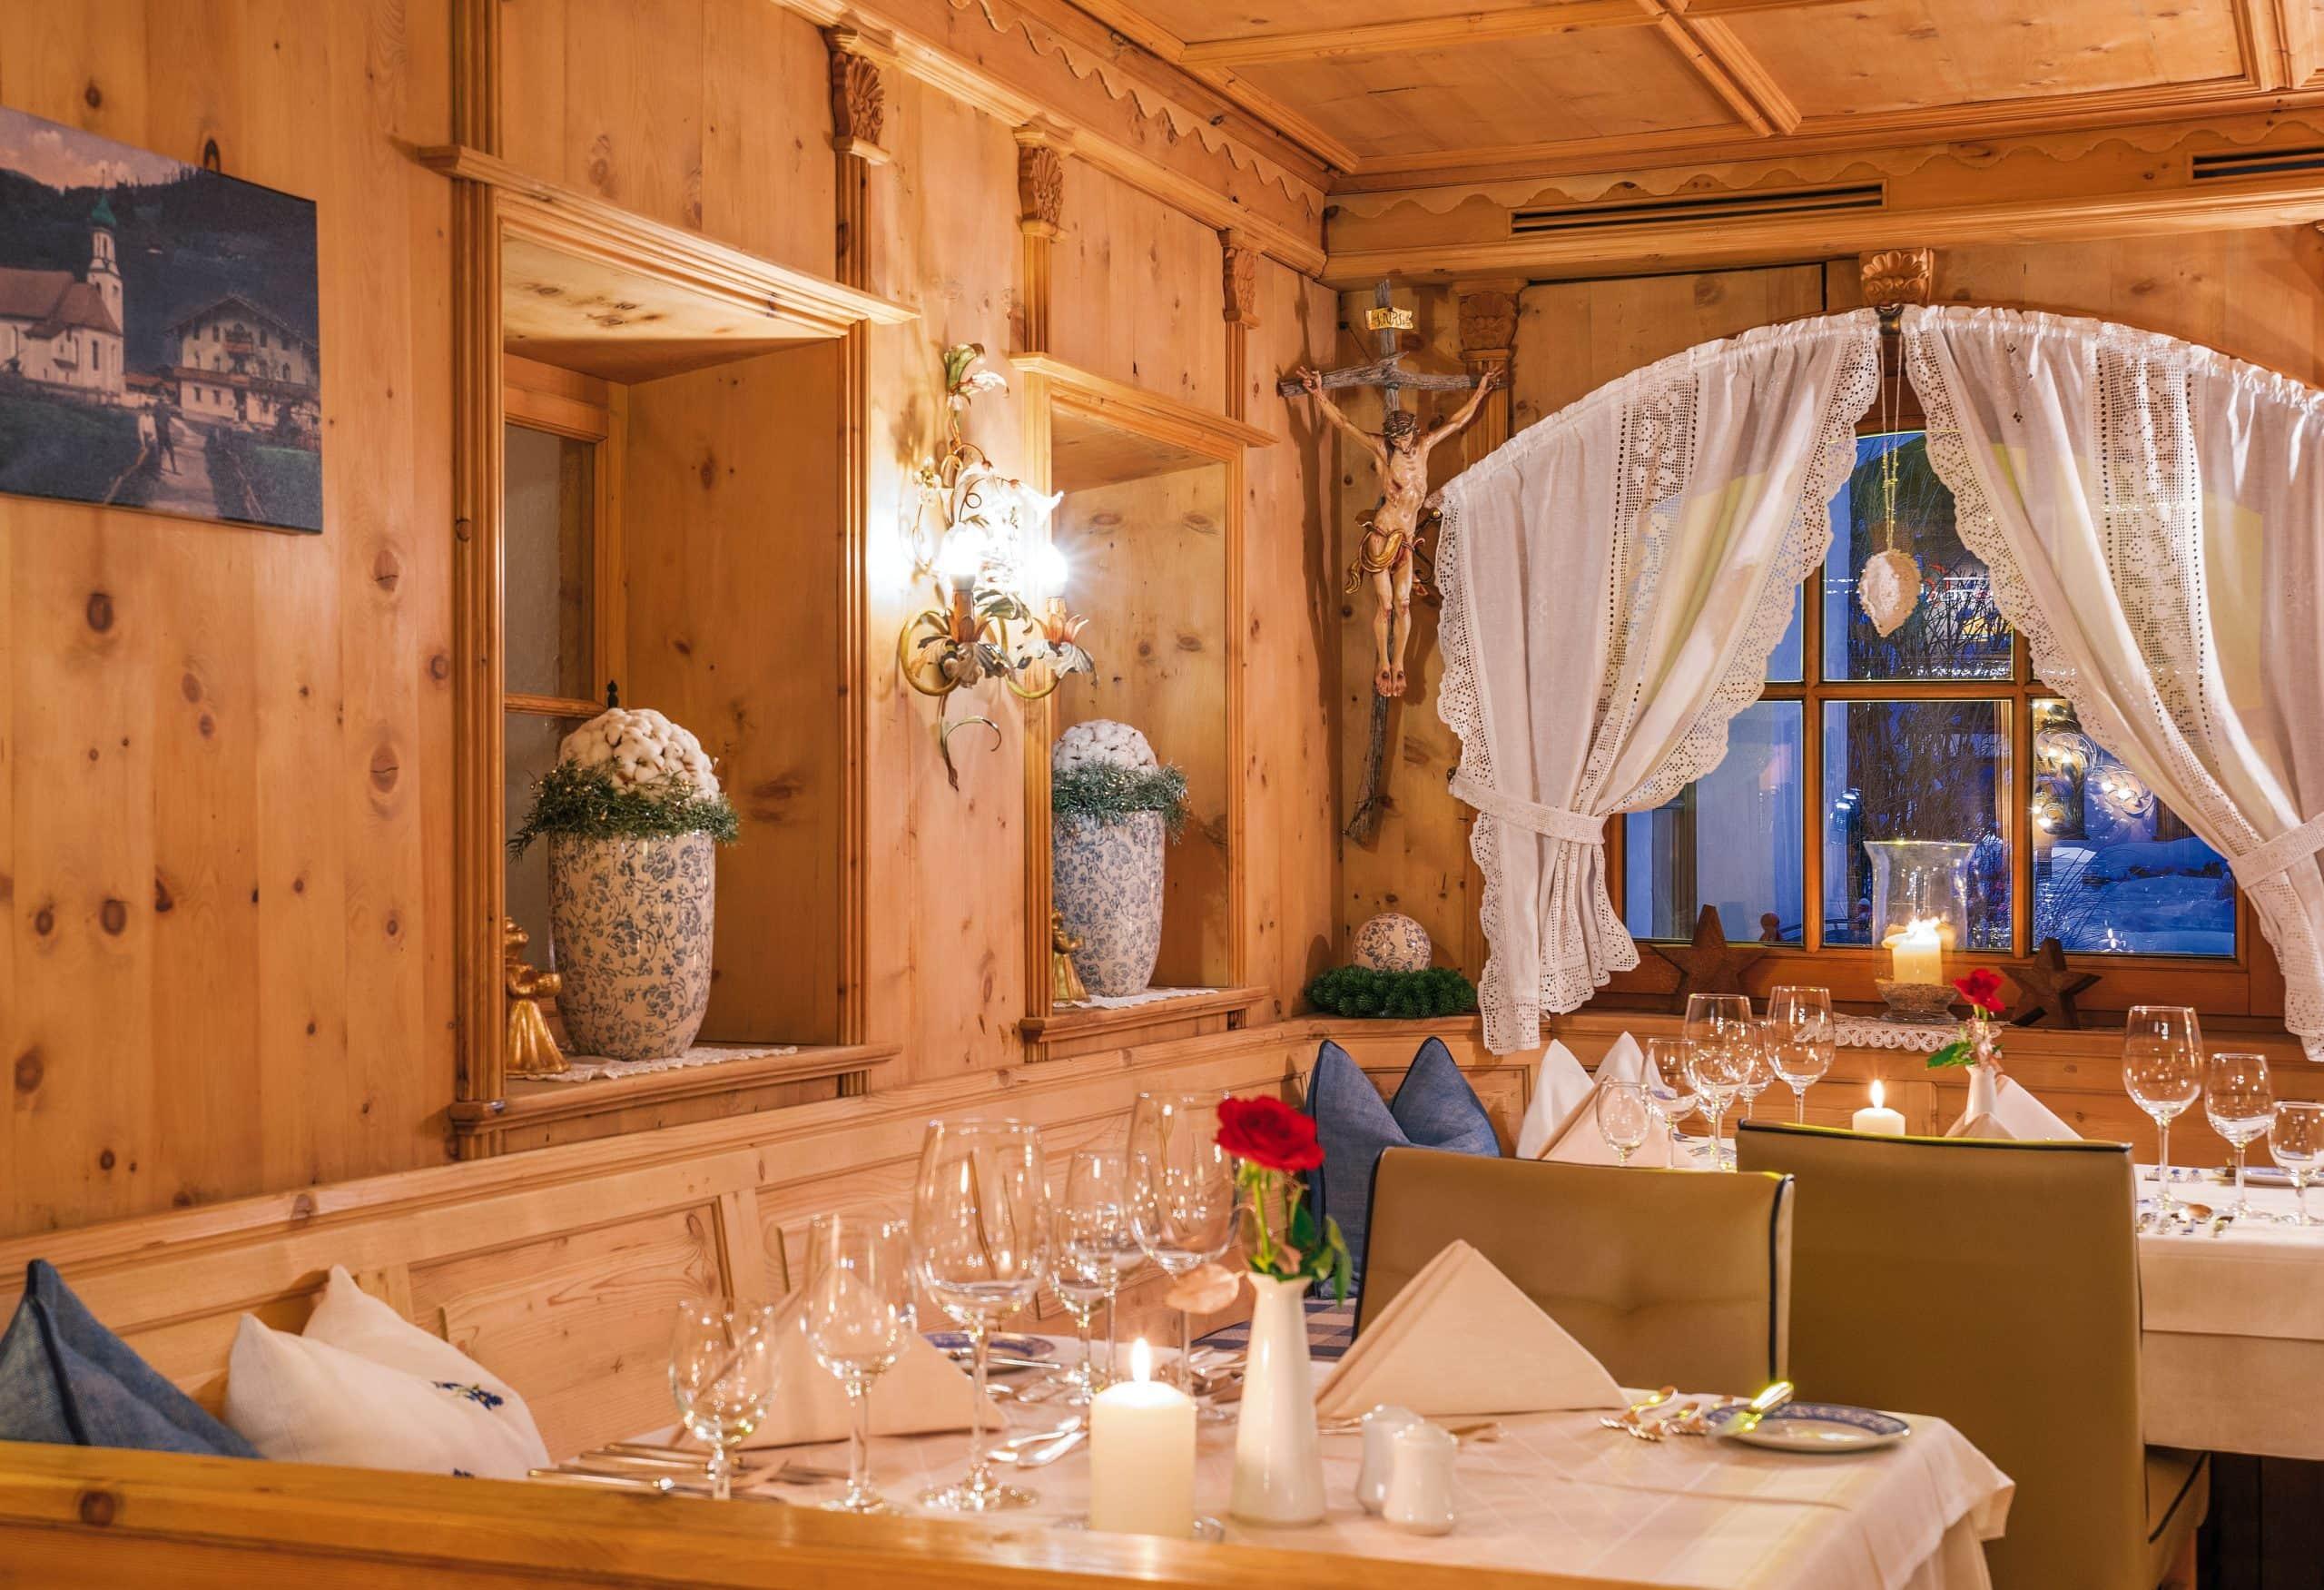 gaspingerhof stube restaurant Stueberl neu 2 scaled